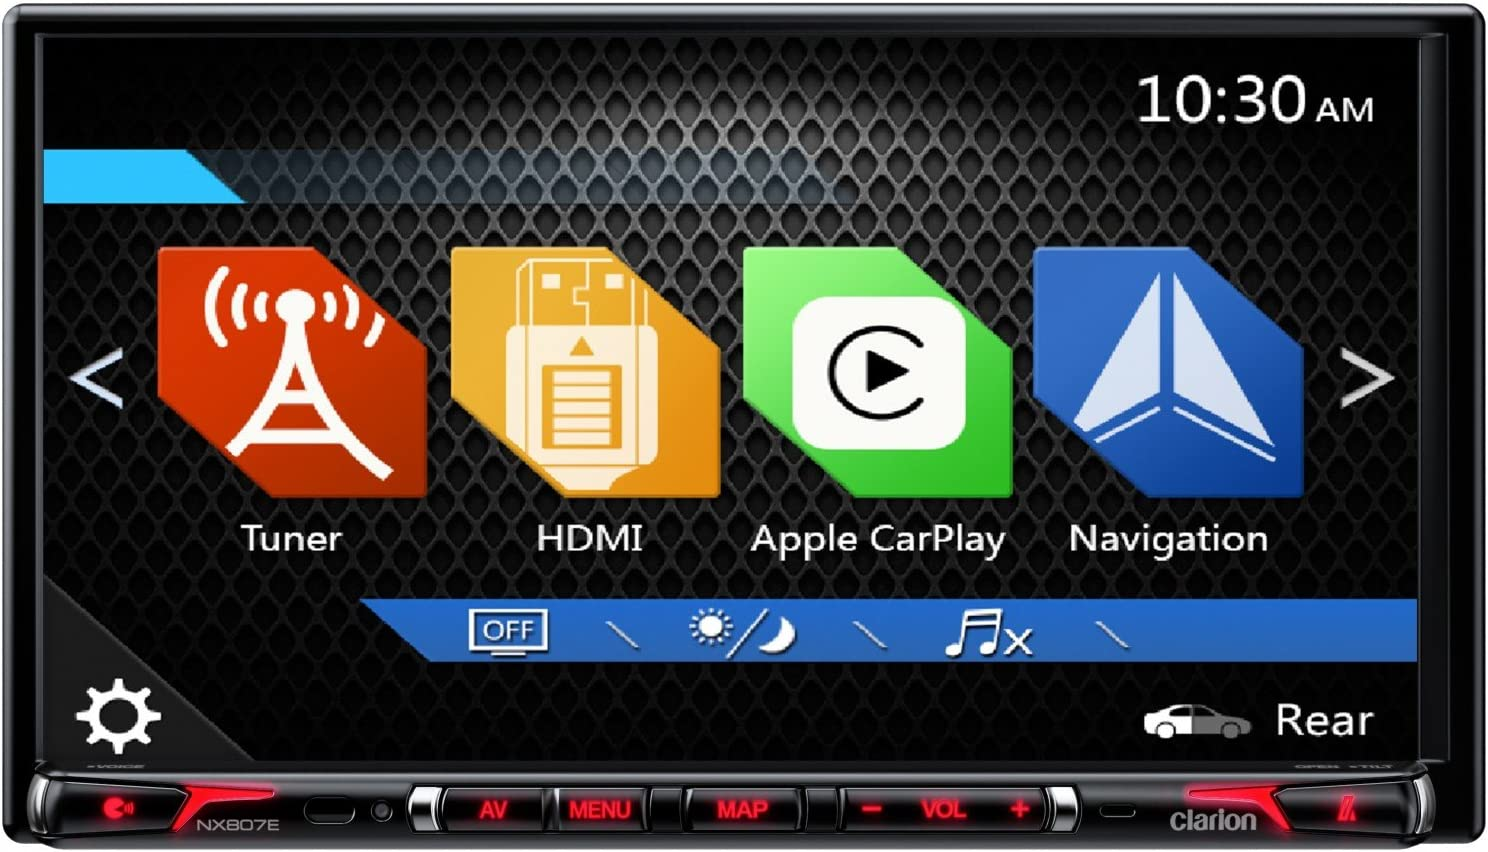 Clarion NX807E 2-DIN Navigationssystem mit Carplay